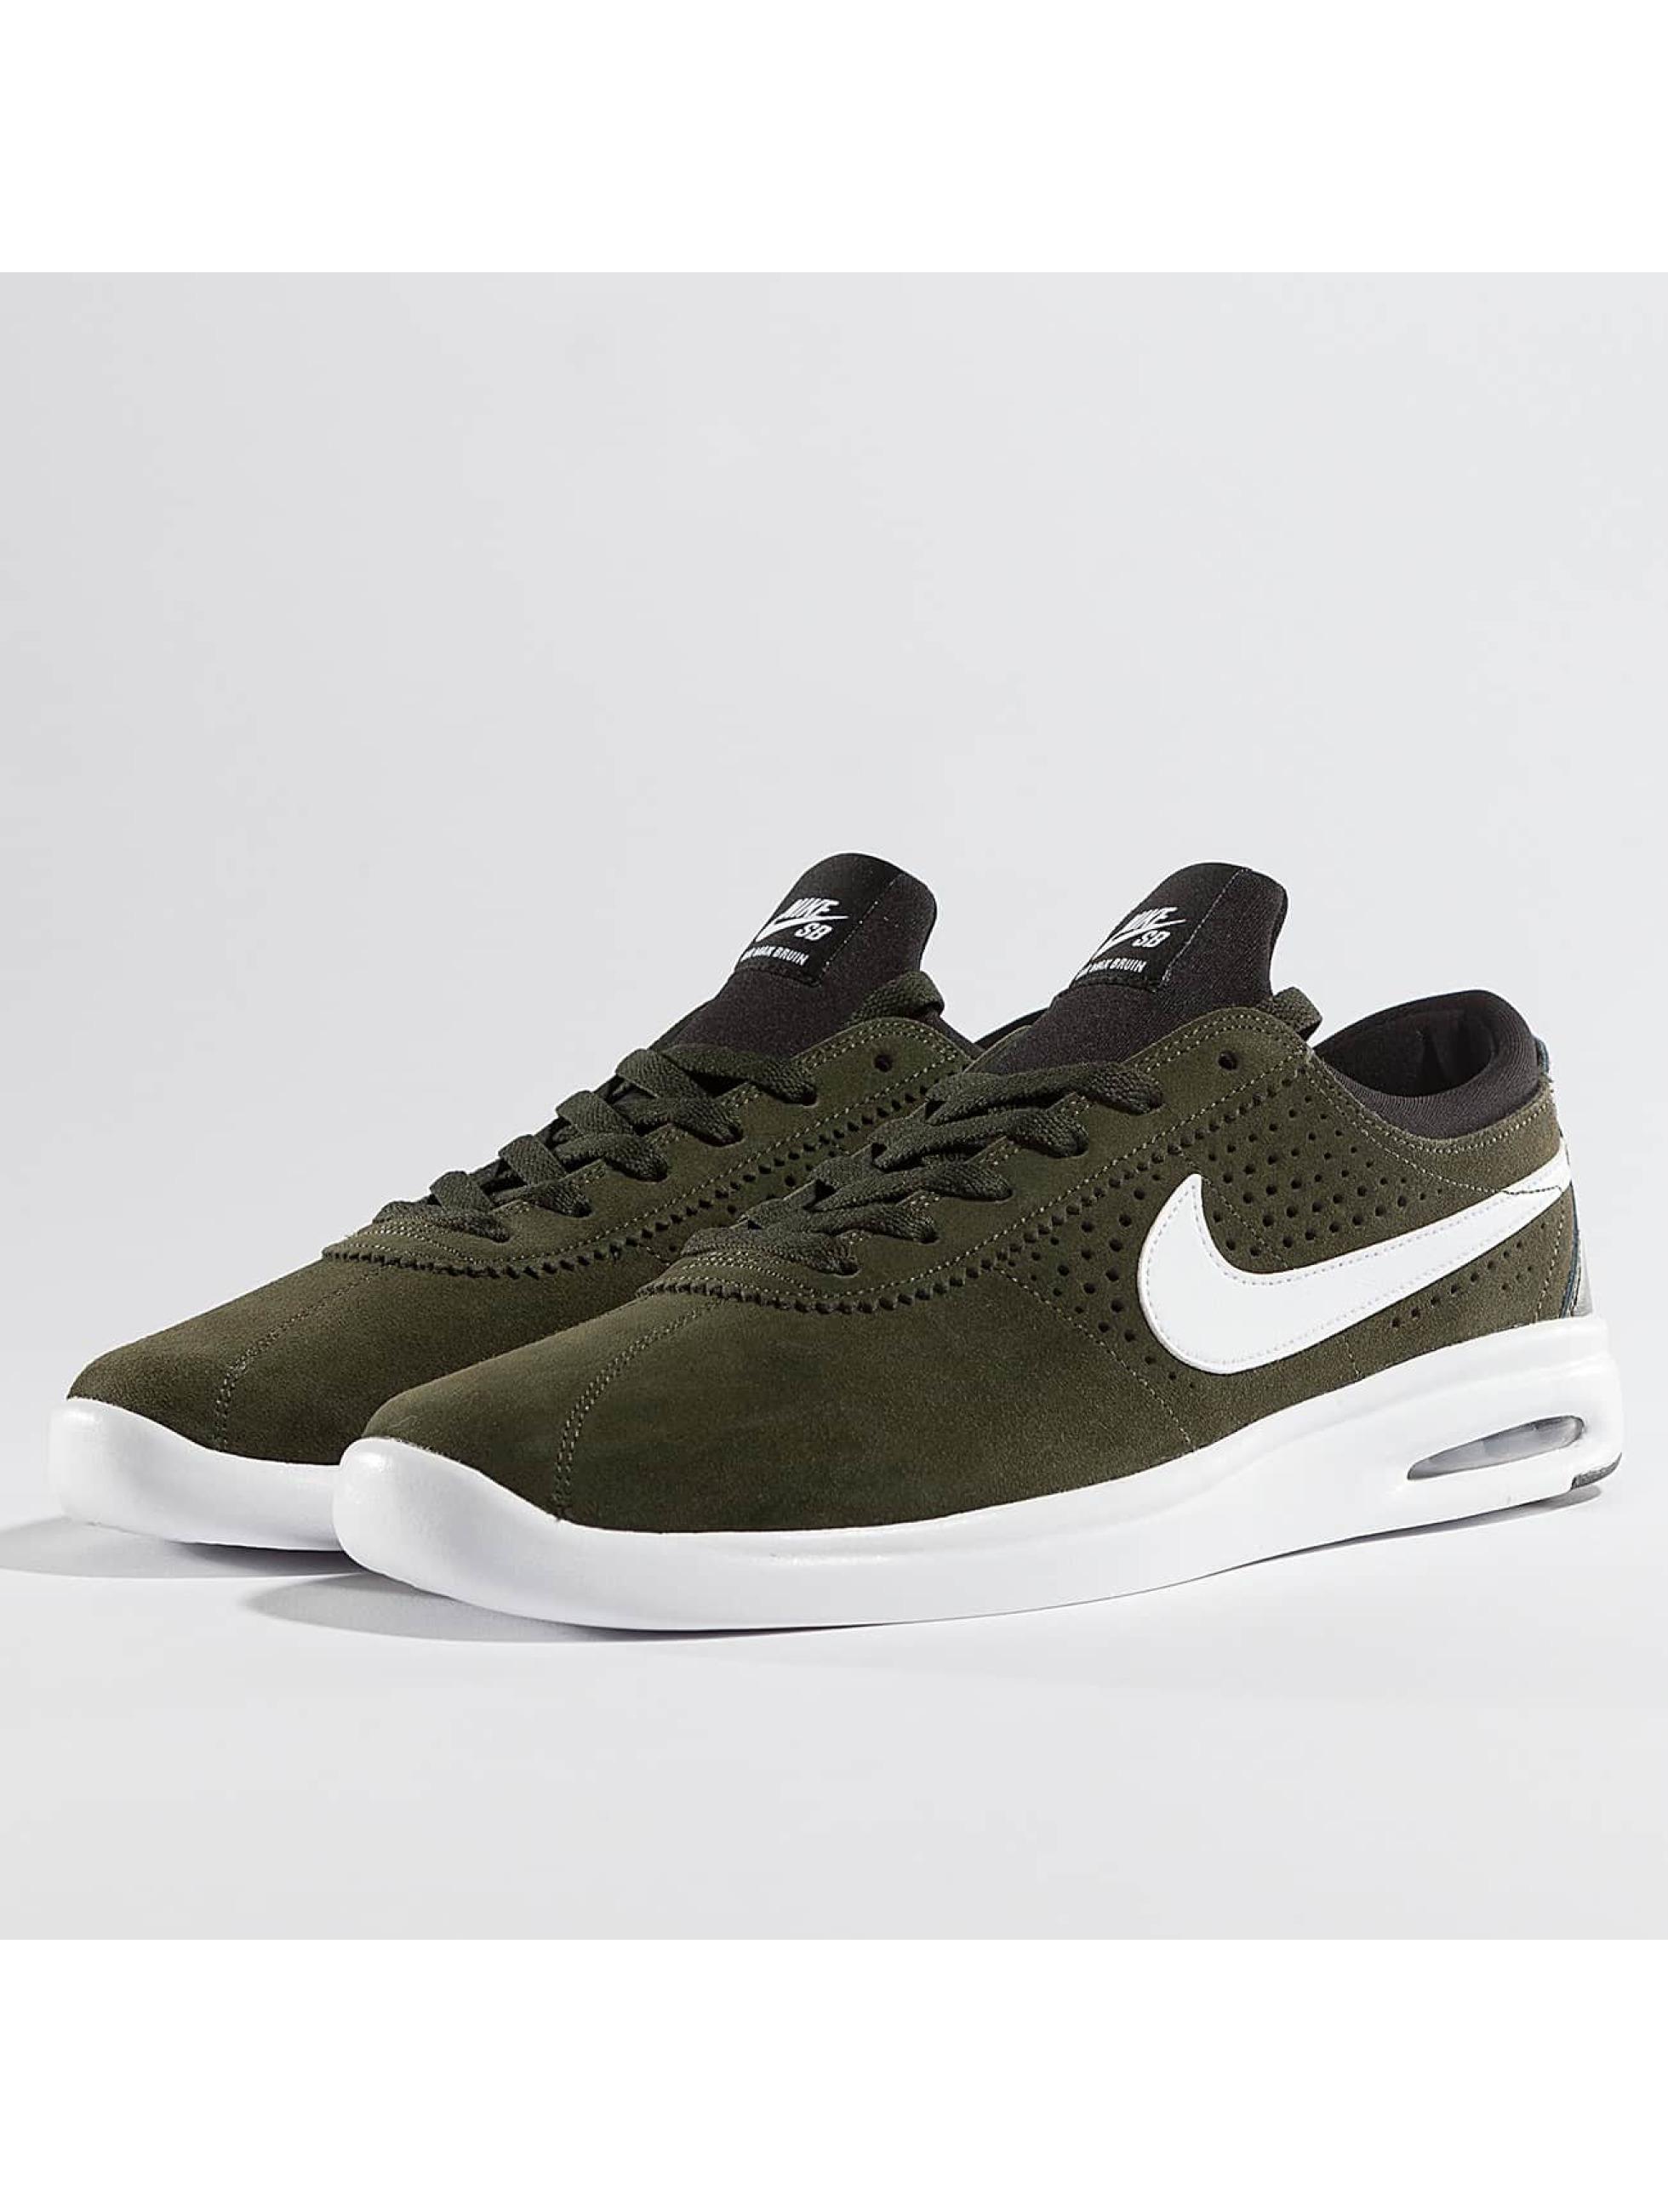 Nike SB Air Max Bruin Vapor Schuhe Turnschuhe Sneaker Skaterschuhe Herren